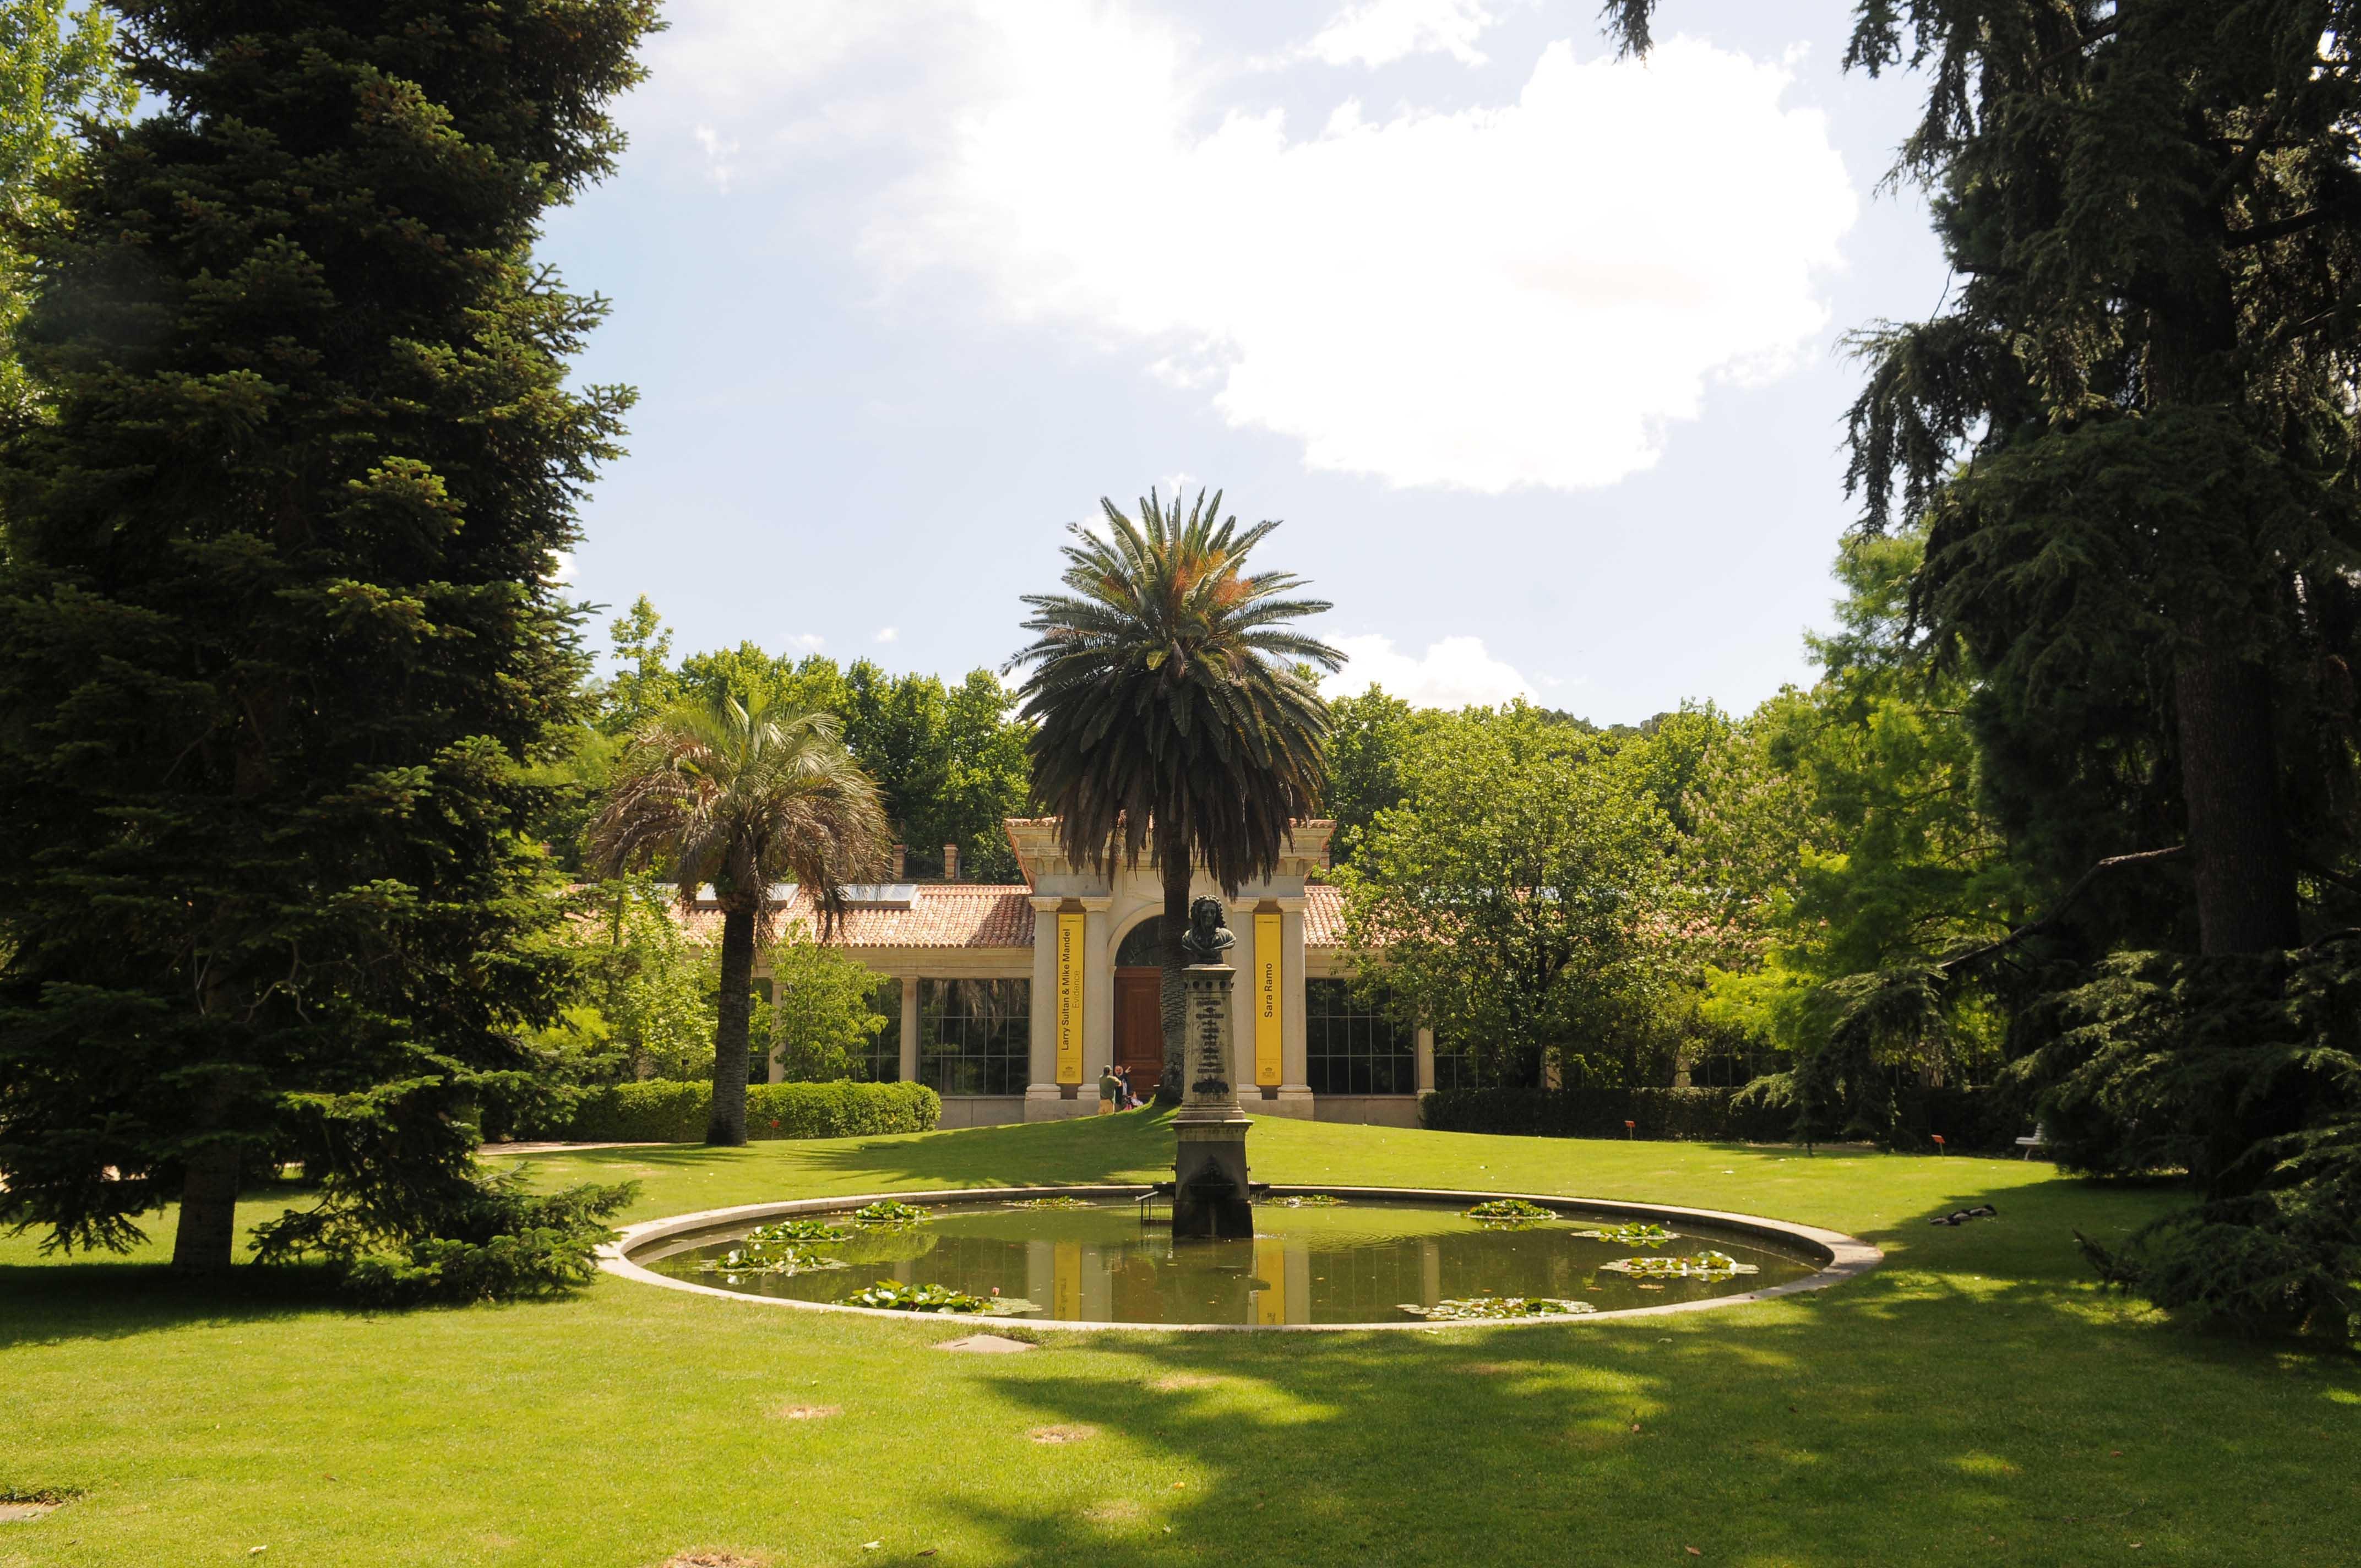 El jard n bot nico mira al futuro ayuntamiento de madrid for Botanico jardin